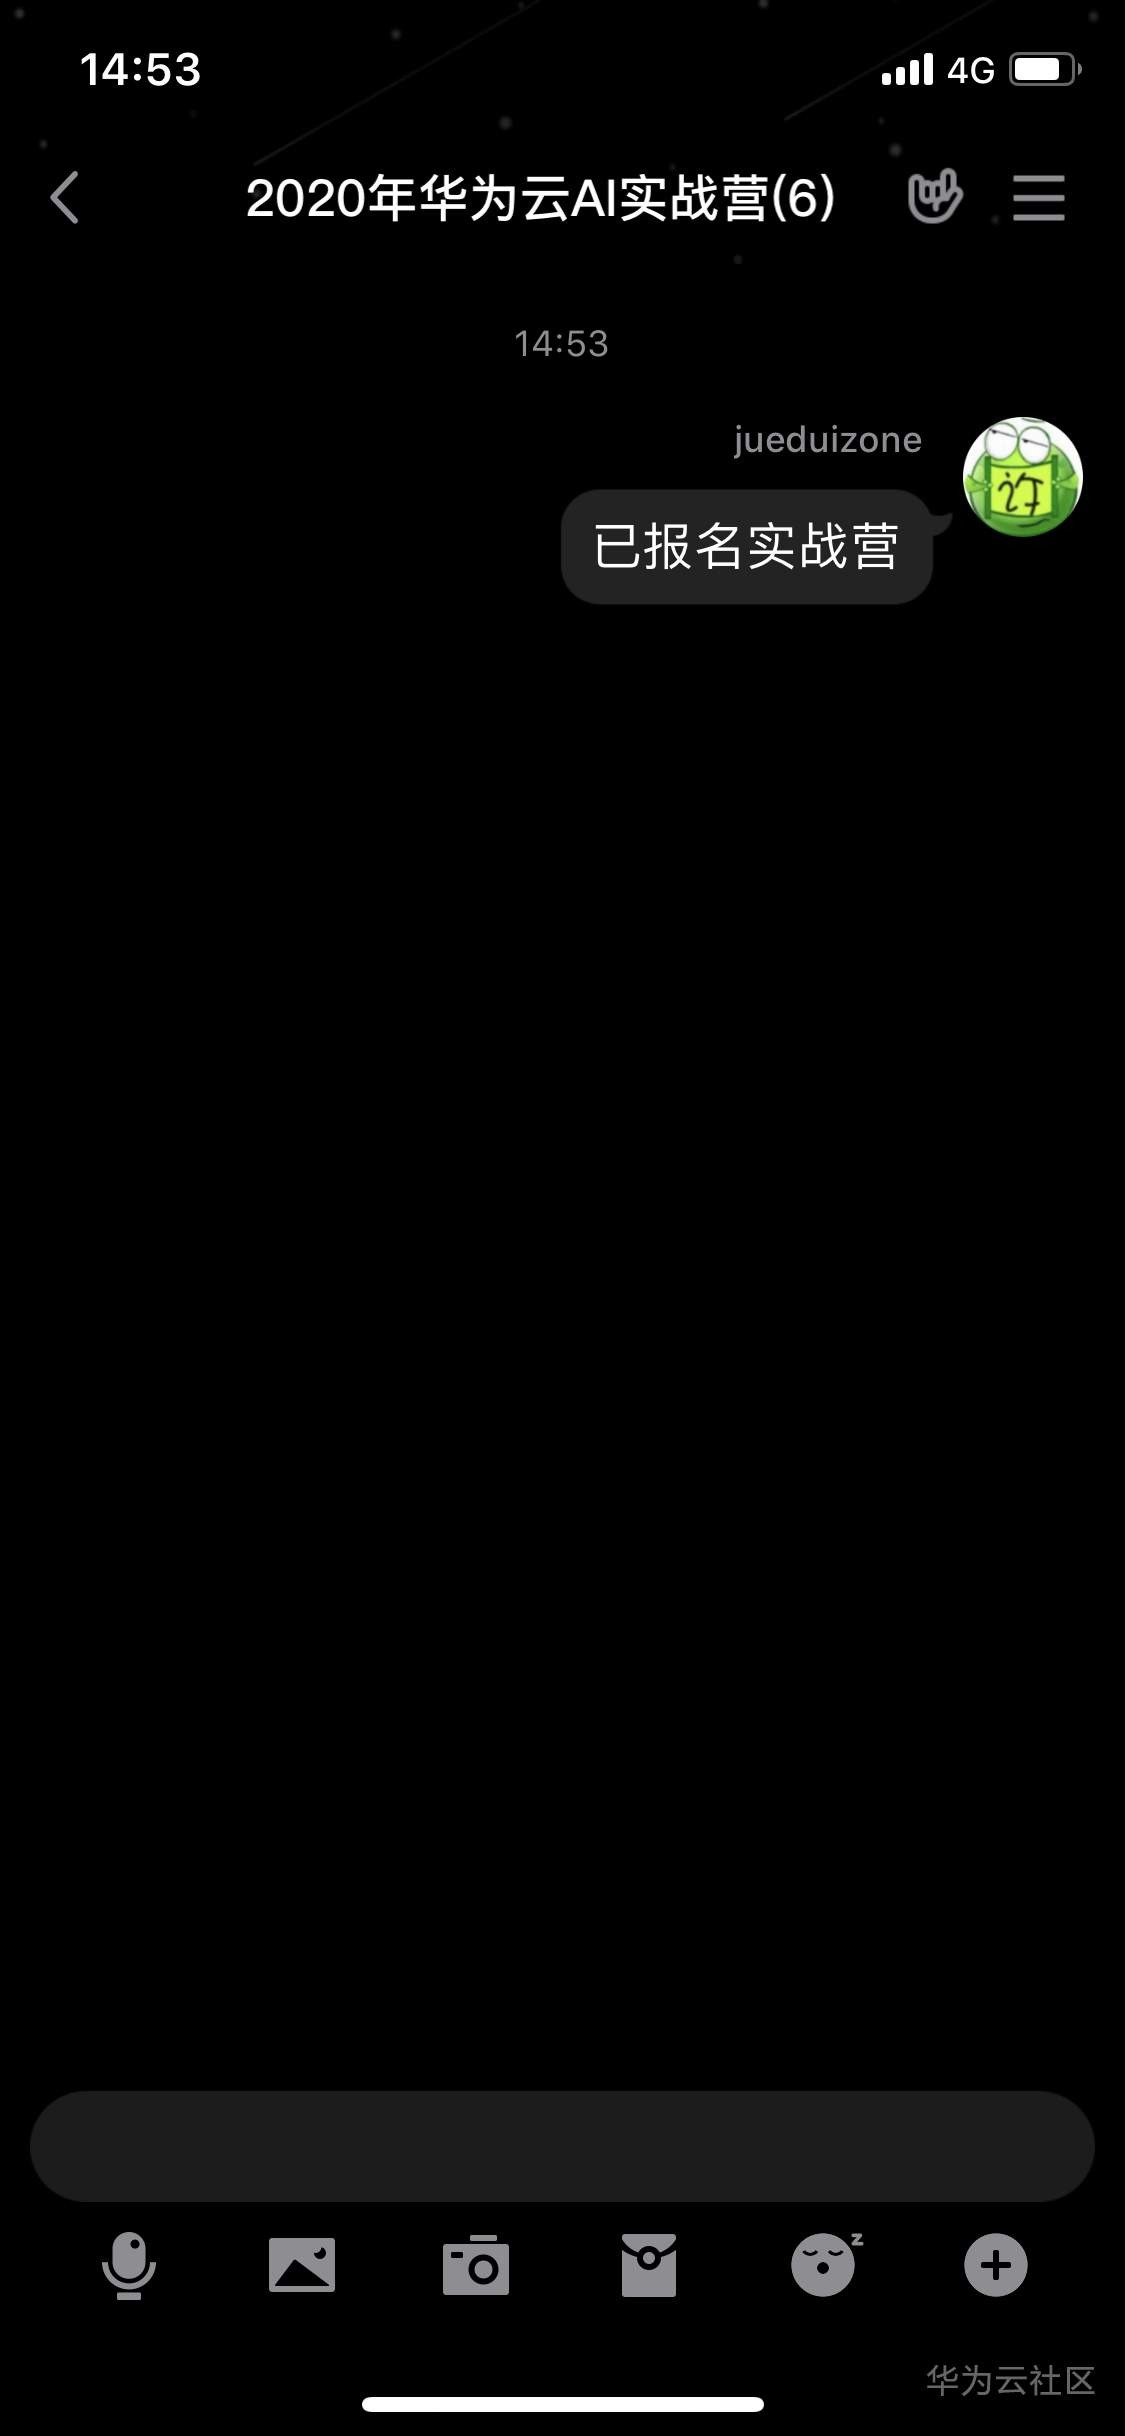 vOPVtR50bsyh5Tfl-3.PNG